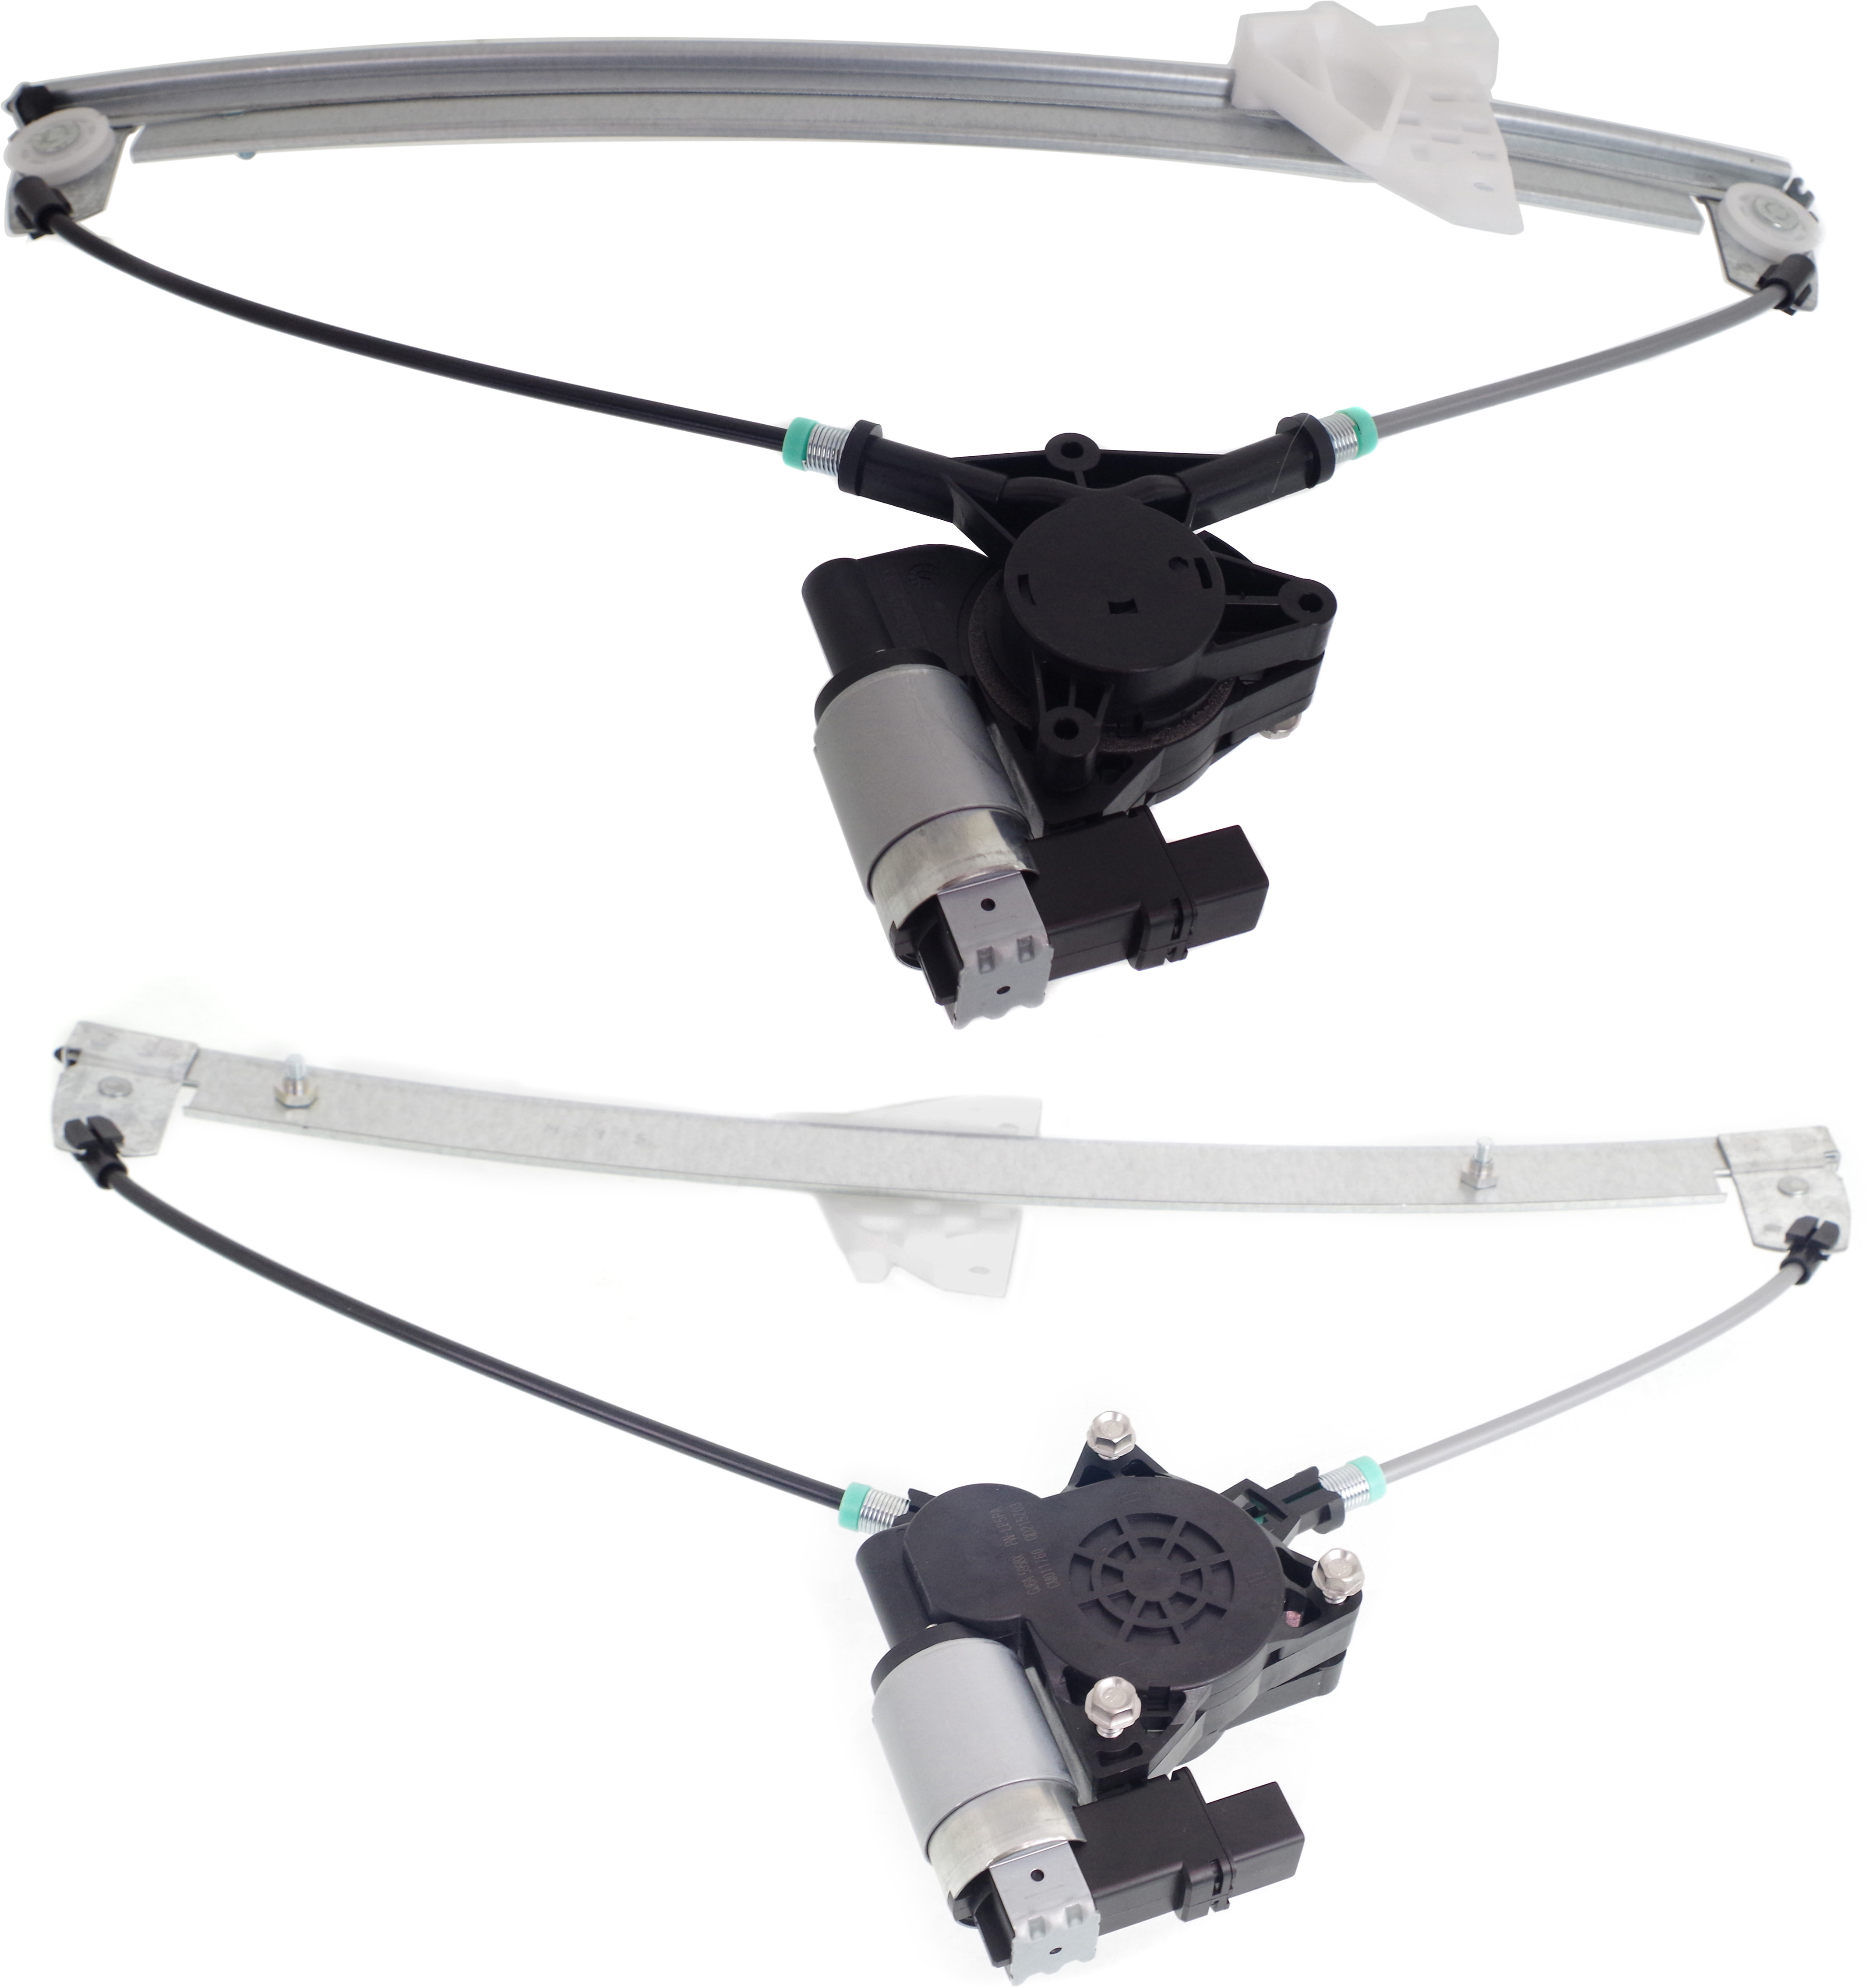 Window Regulator Motor for 2007-2015 Mazda CX-9